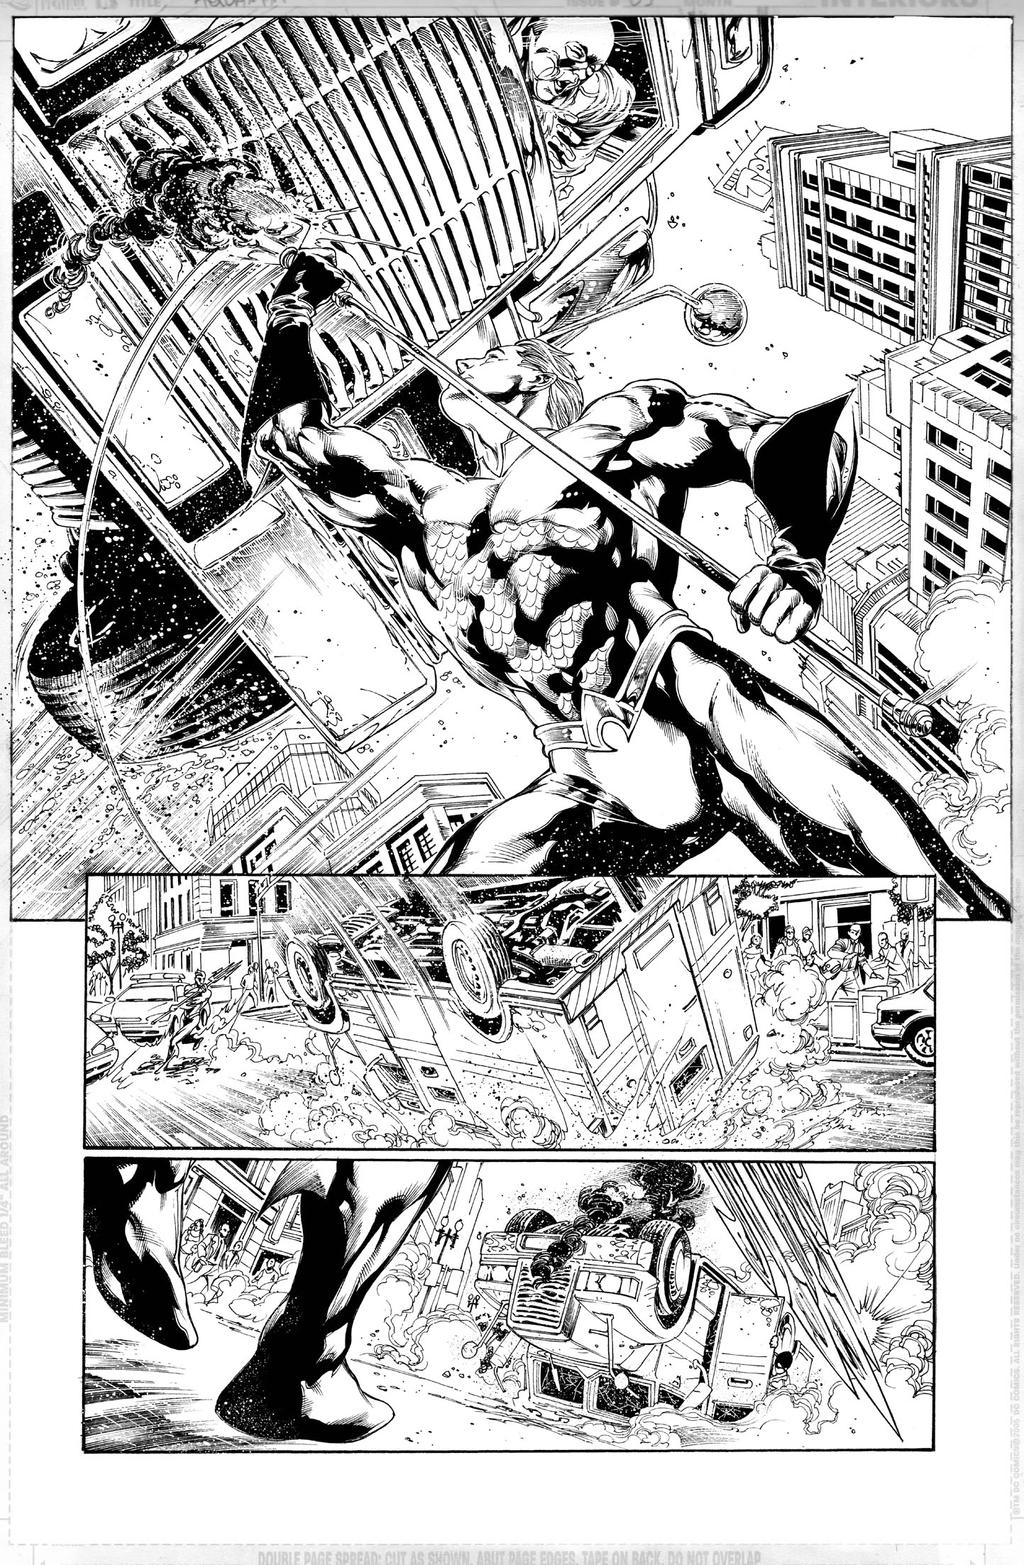 AQUAMAN Issue 01 Page 06 by JoePrado2010